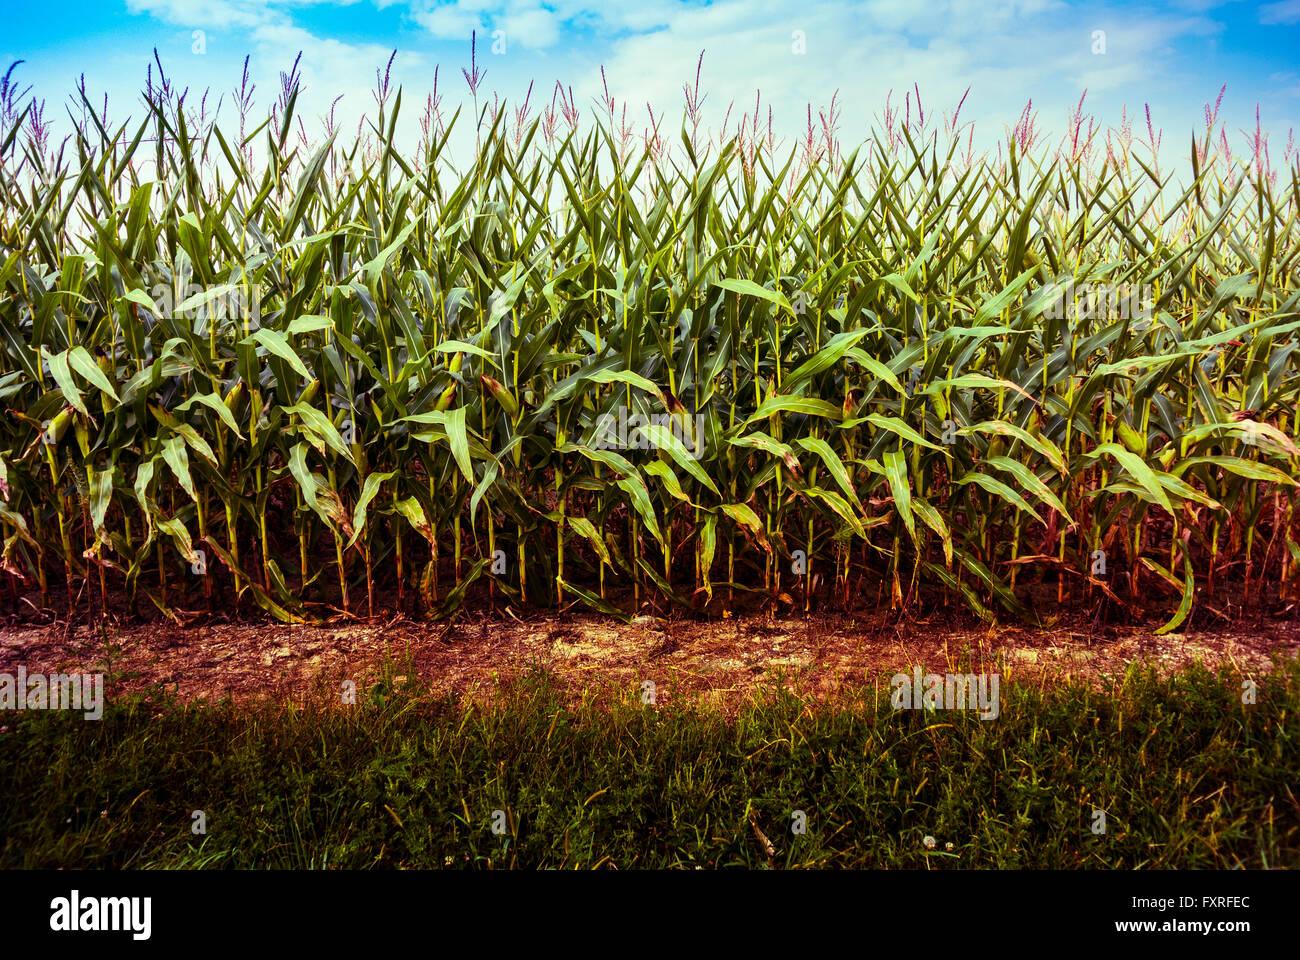 Minimalist view, row of corn in Indiana, USA. - Stock Image